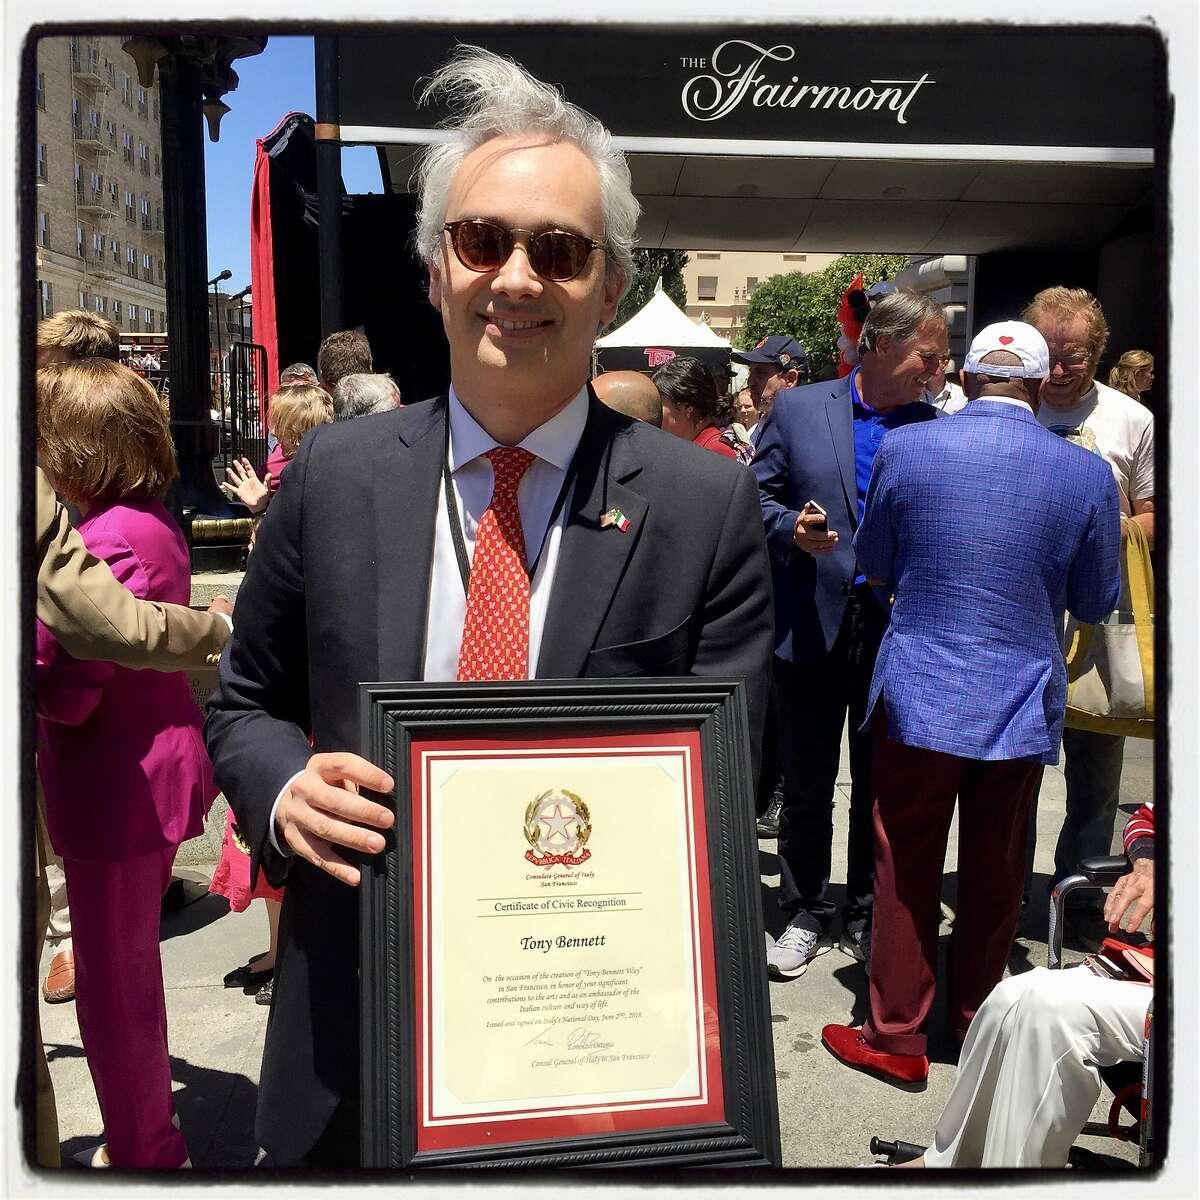 Italian Consul General Lorenzo Ortona presented a proclamation from Italy honoring Tony Bennett at the Fairmont Hotel. June 2, 2018.